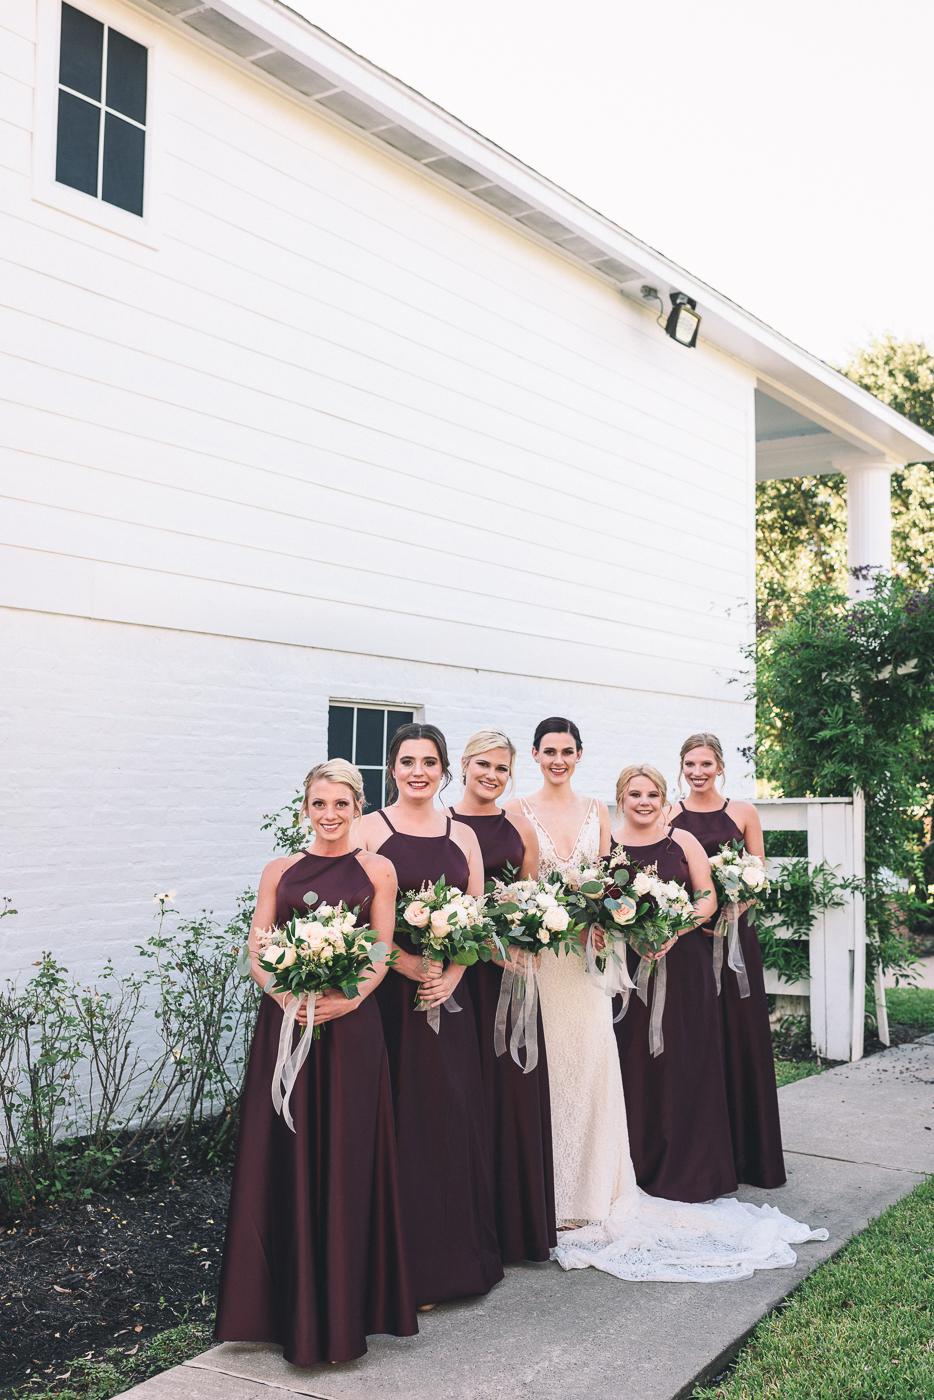 brides maids wedding party portraits dresses up do